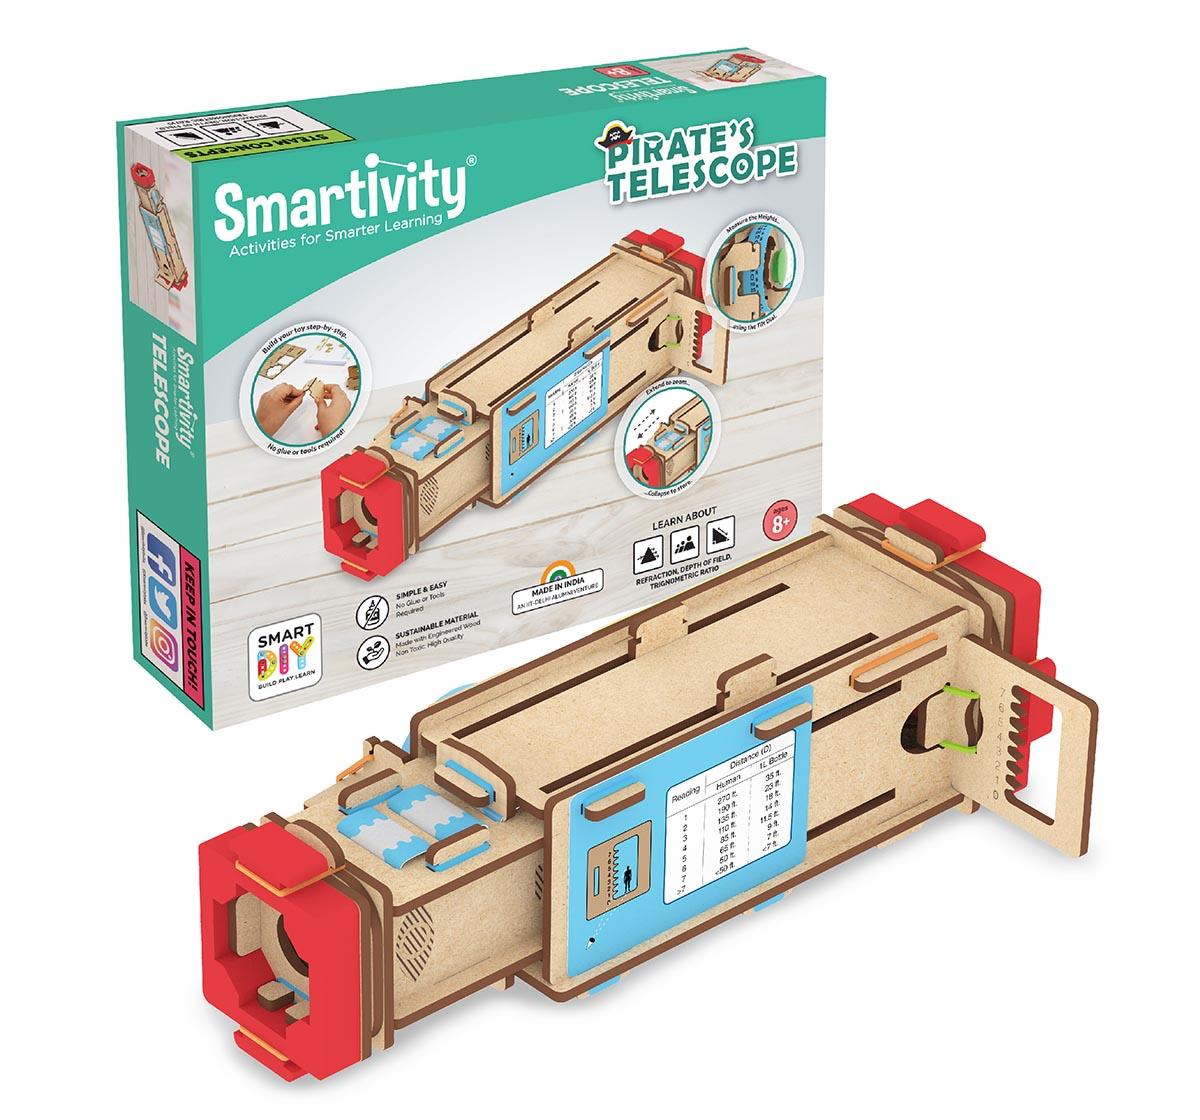 Smartivity | Smartivity Pirate's Telescope STEM STEAM Educational DIY Building Construction Activity Toy Game Kit